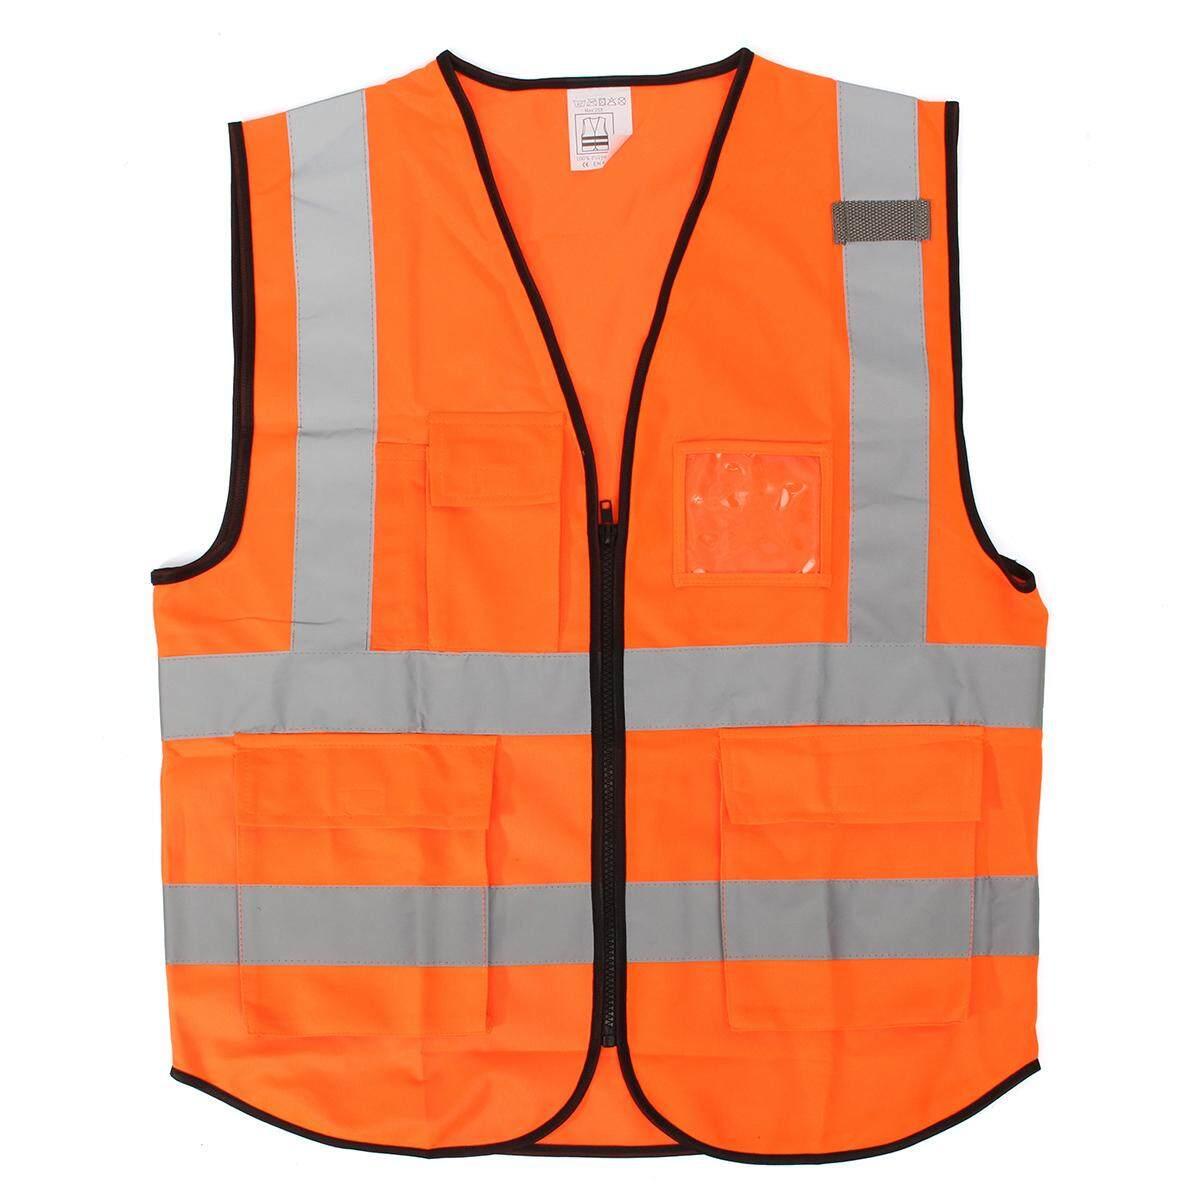 Orange Xl Hi Vis Vest Workwear Clothing Safety Reflective Vest Safety Vest Reflective Logo Printing By Freebang